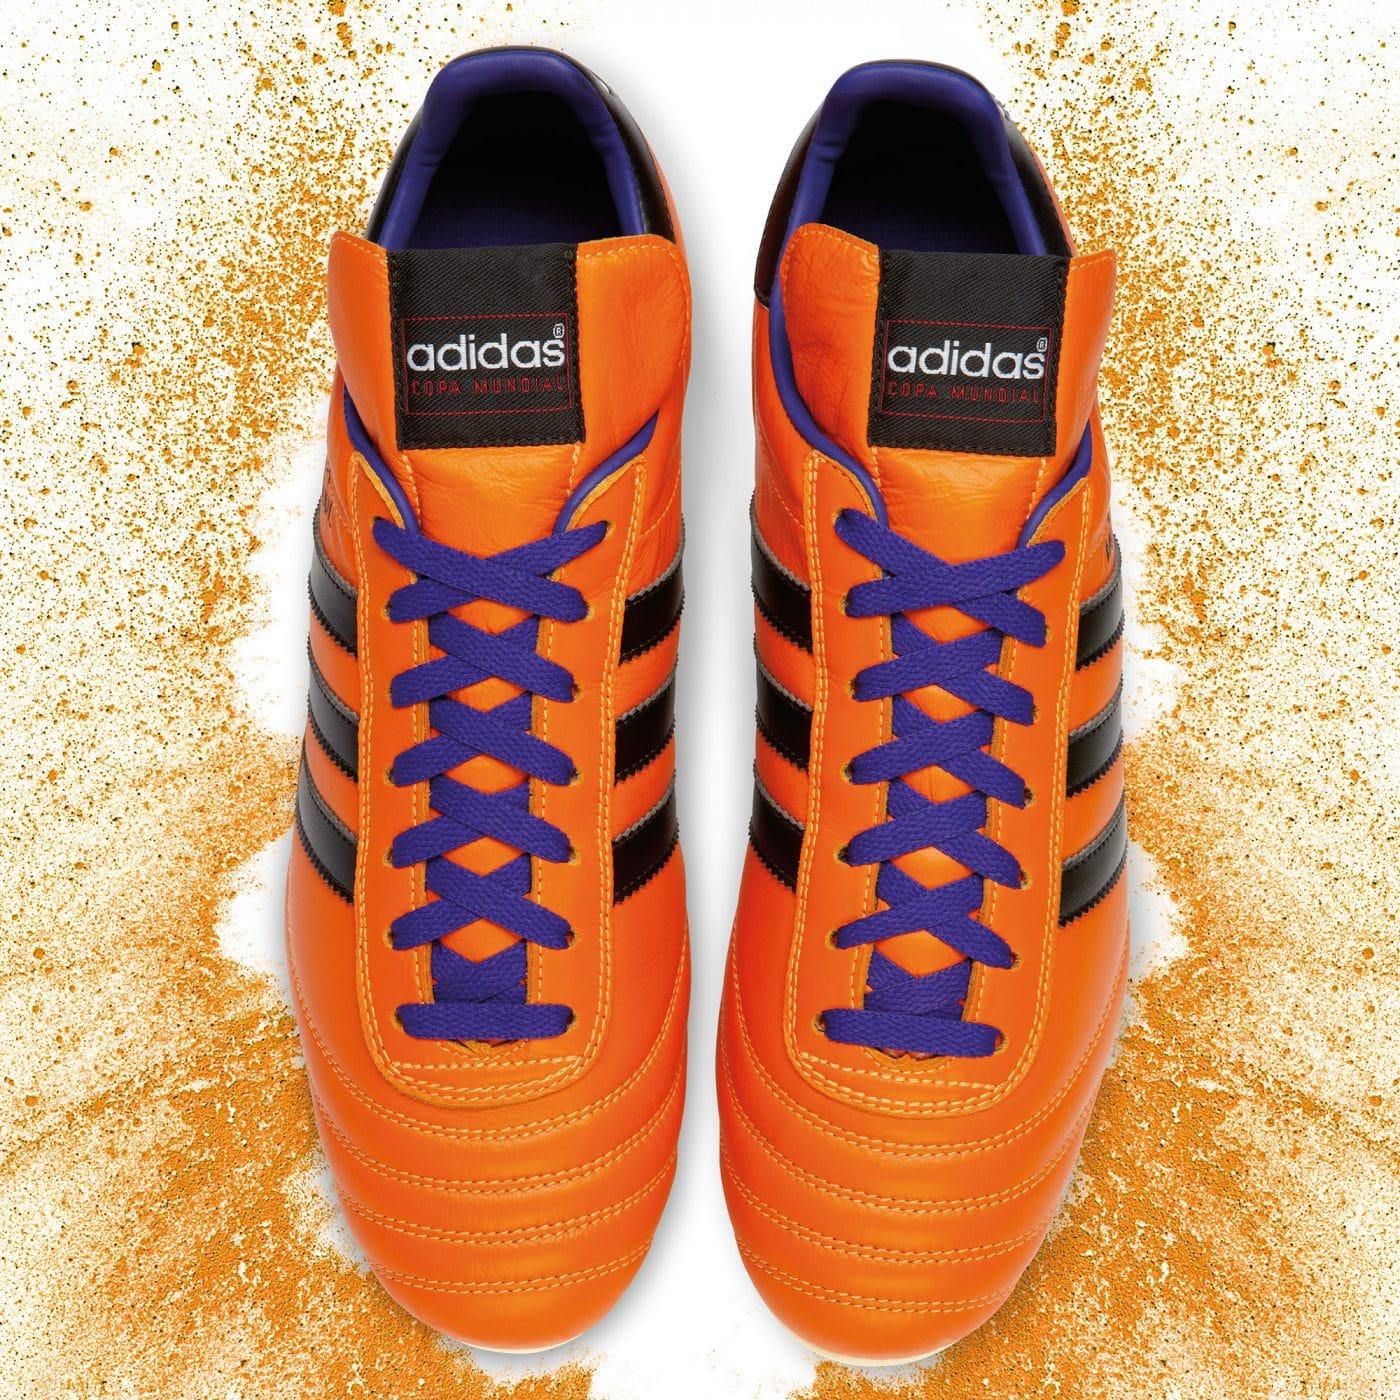 adidas-copa-mundial-samba-pack-orange